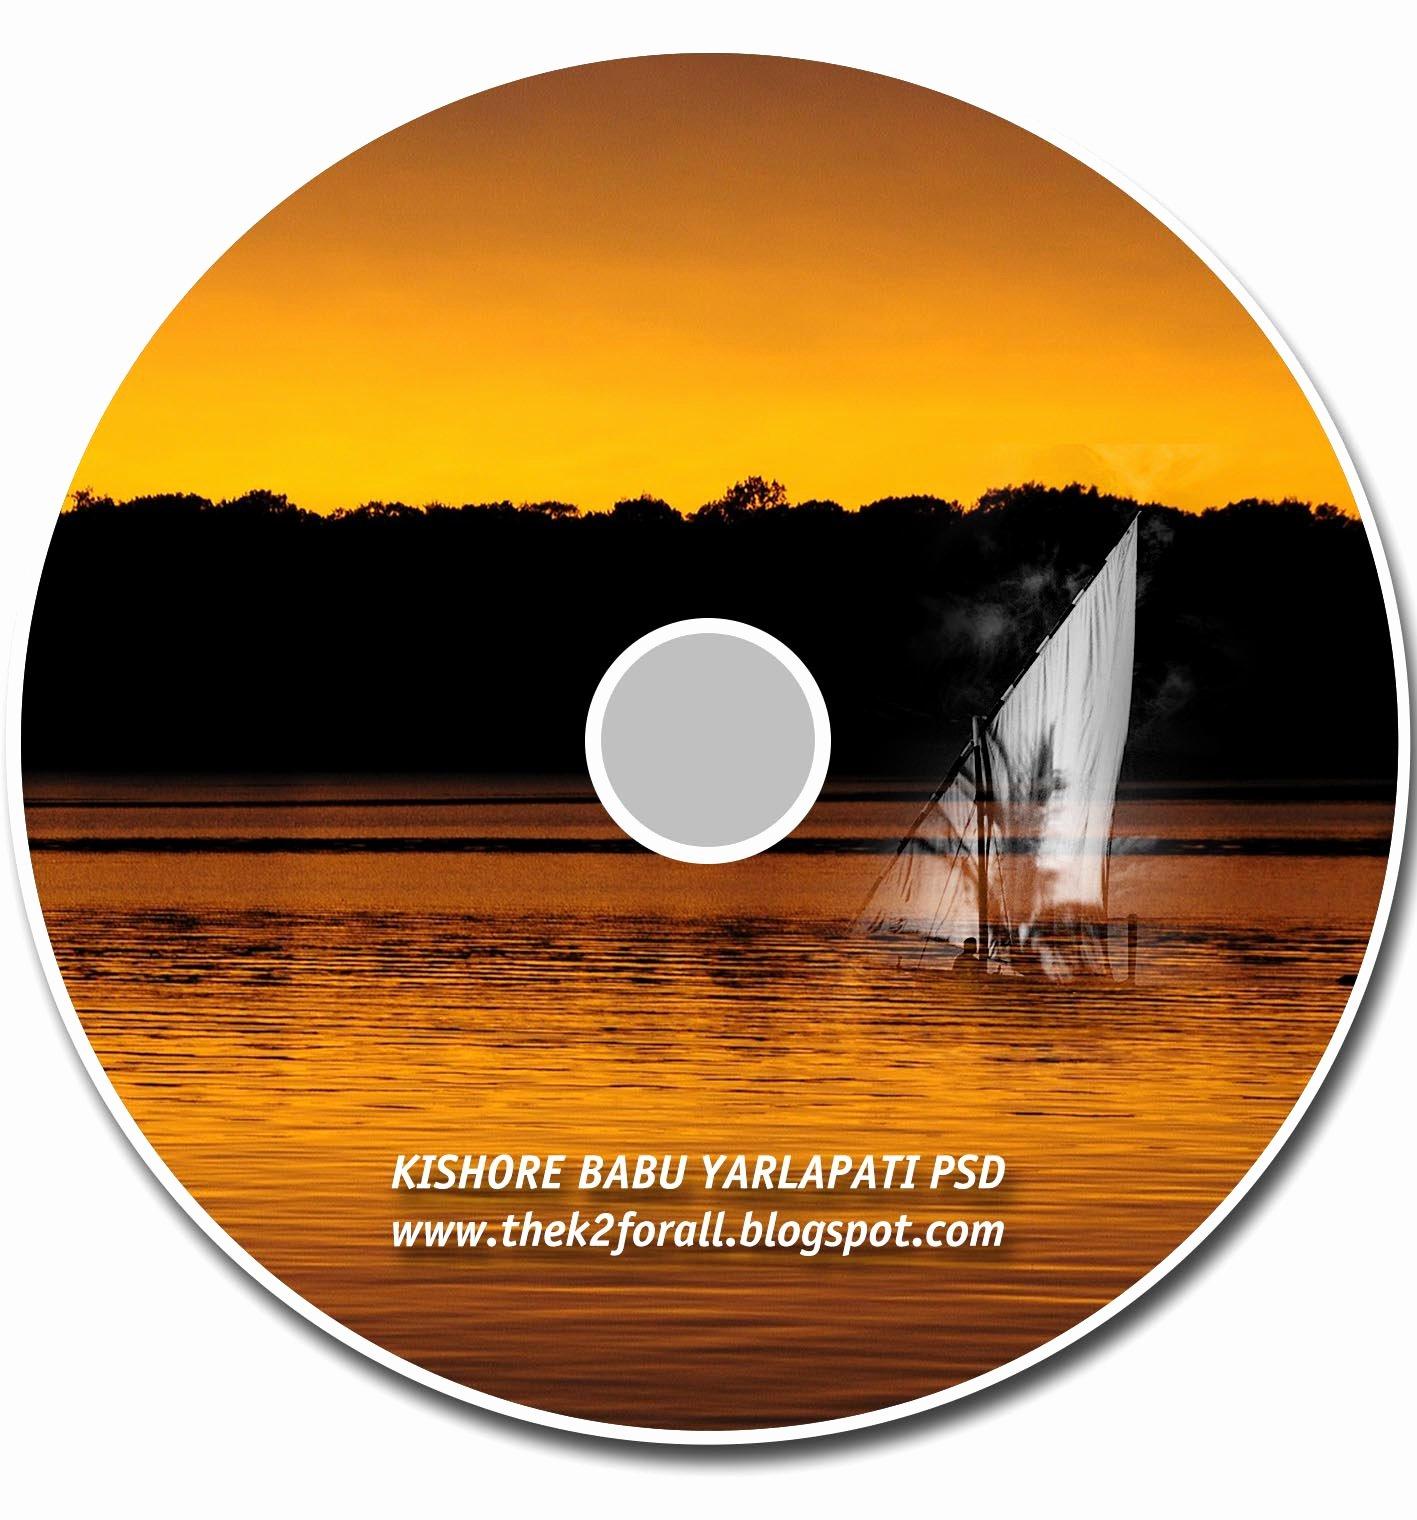 Free Shop Karizma Album Free Cd Templates with Psd